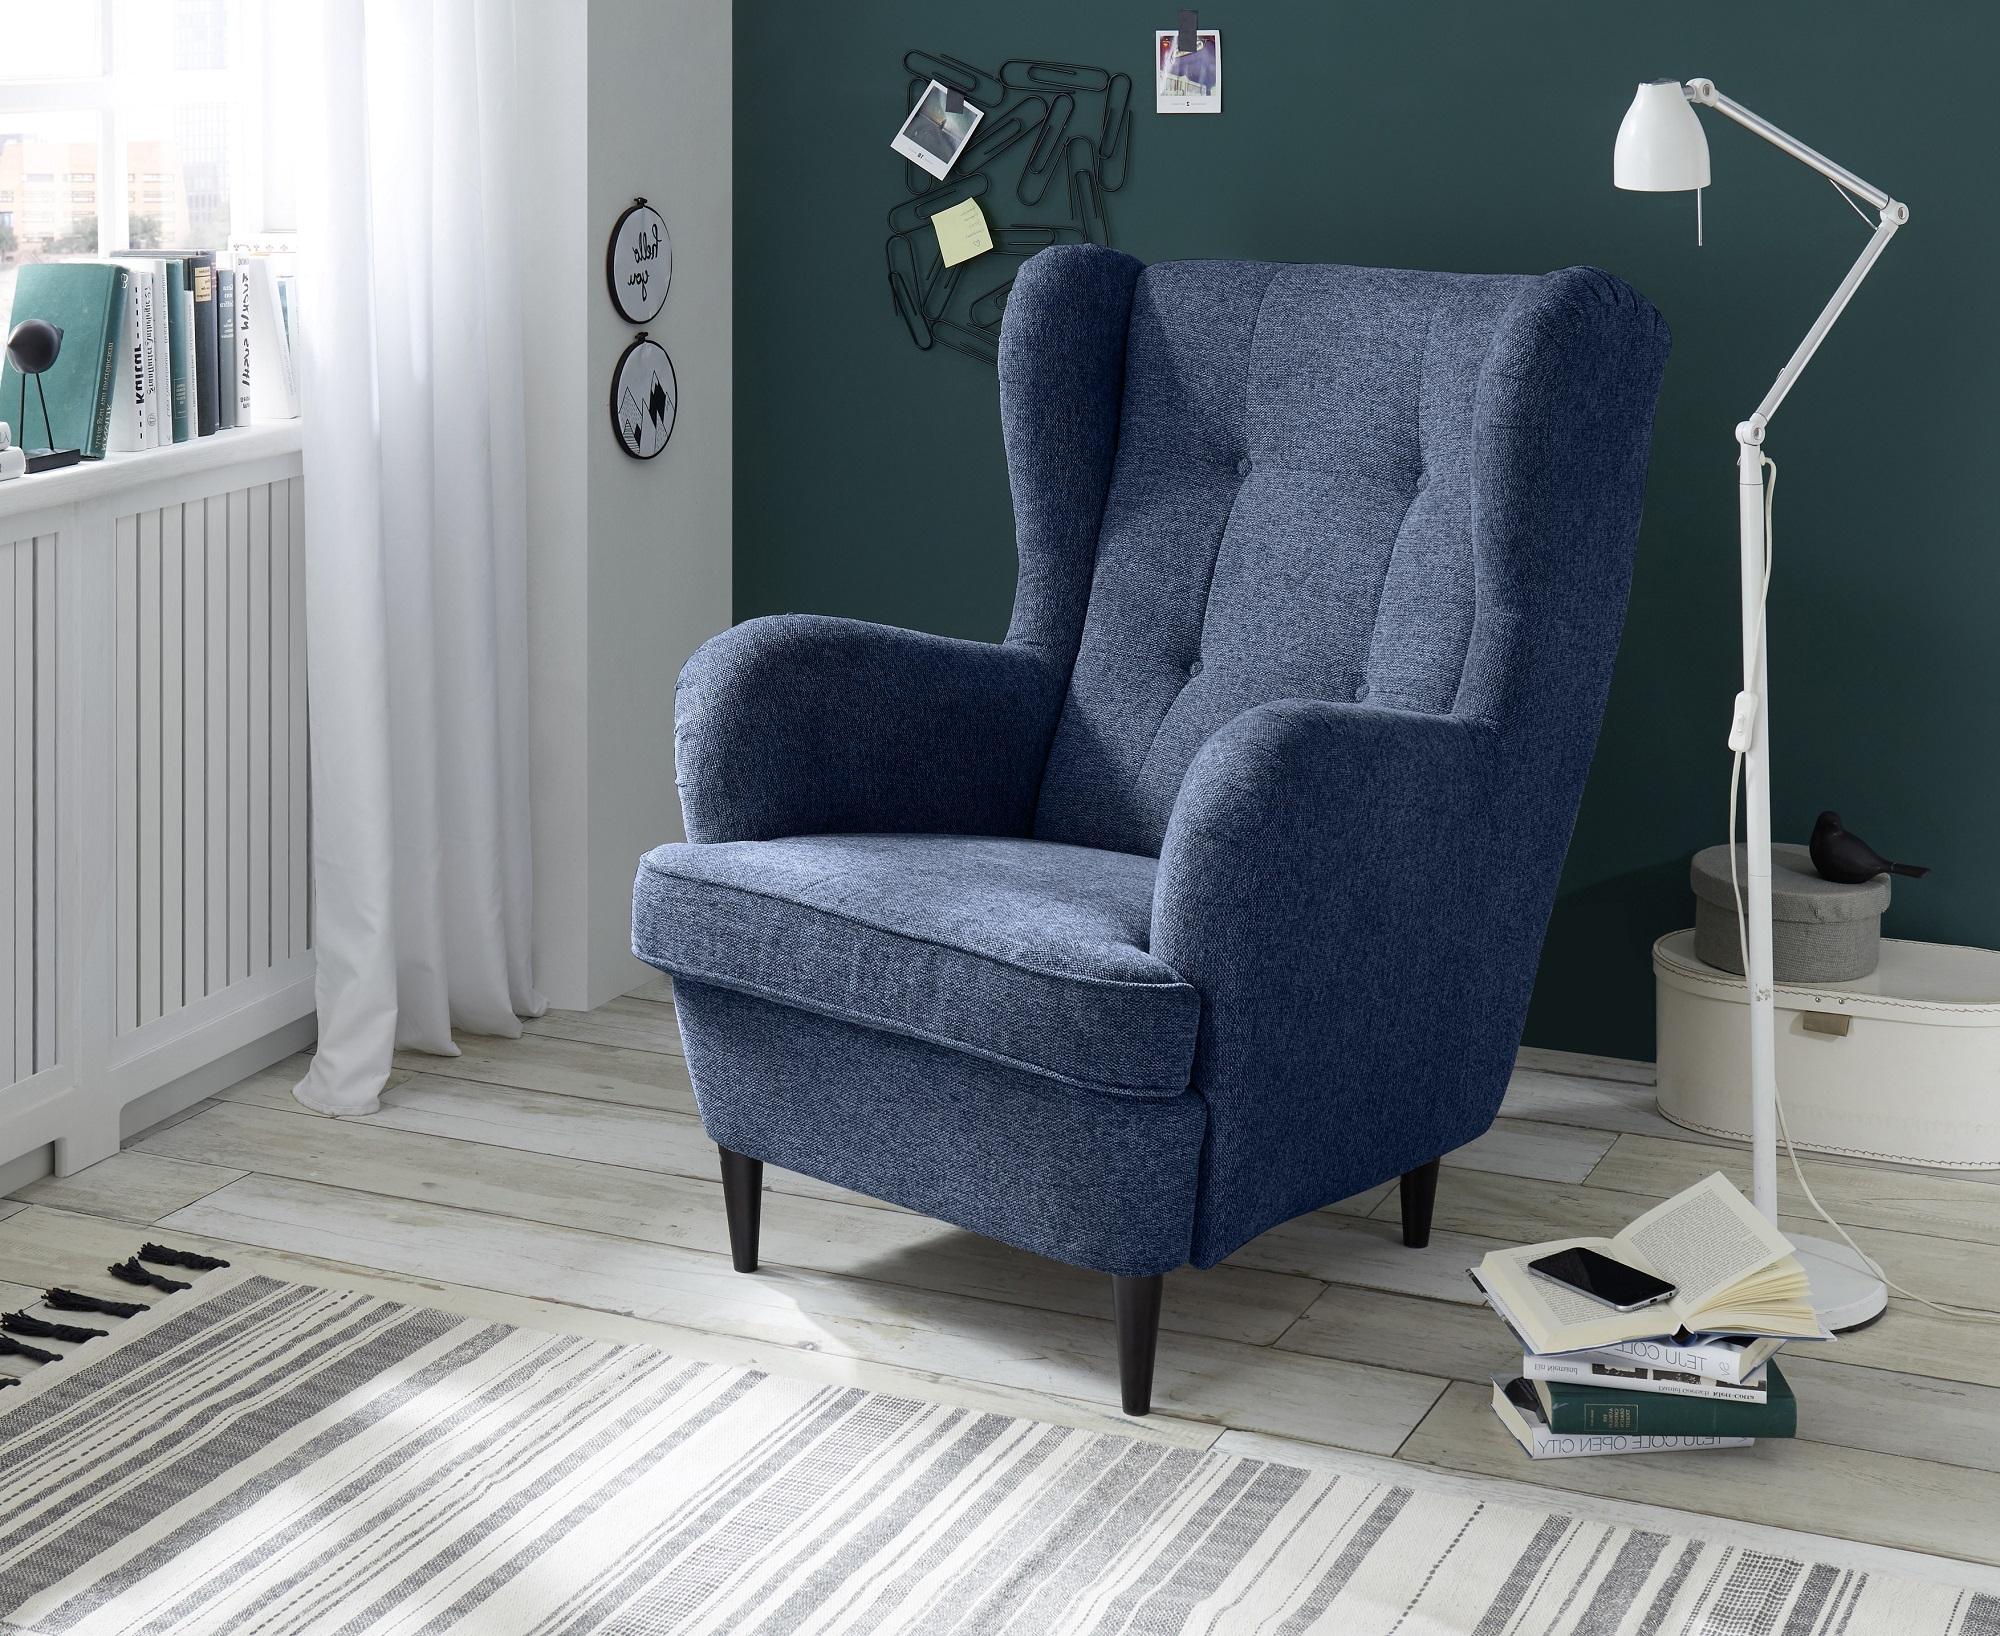 Fotoliu fix tapitat cu stofa si picioare din lemn, Oskard Albastru, l78xA98xH102 cm imagine